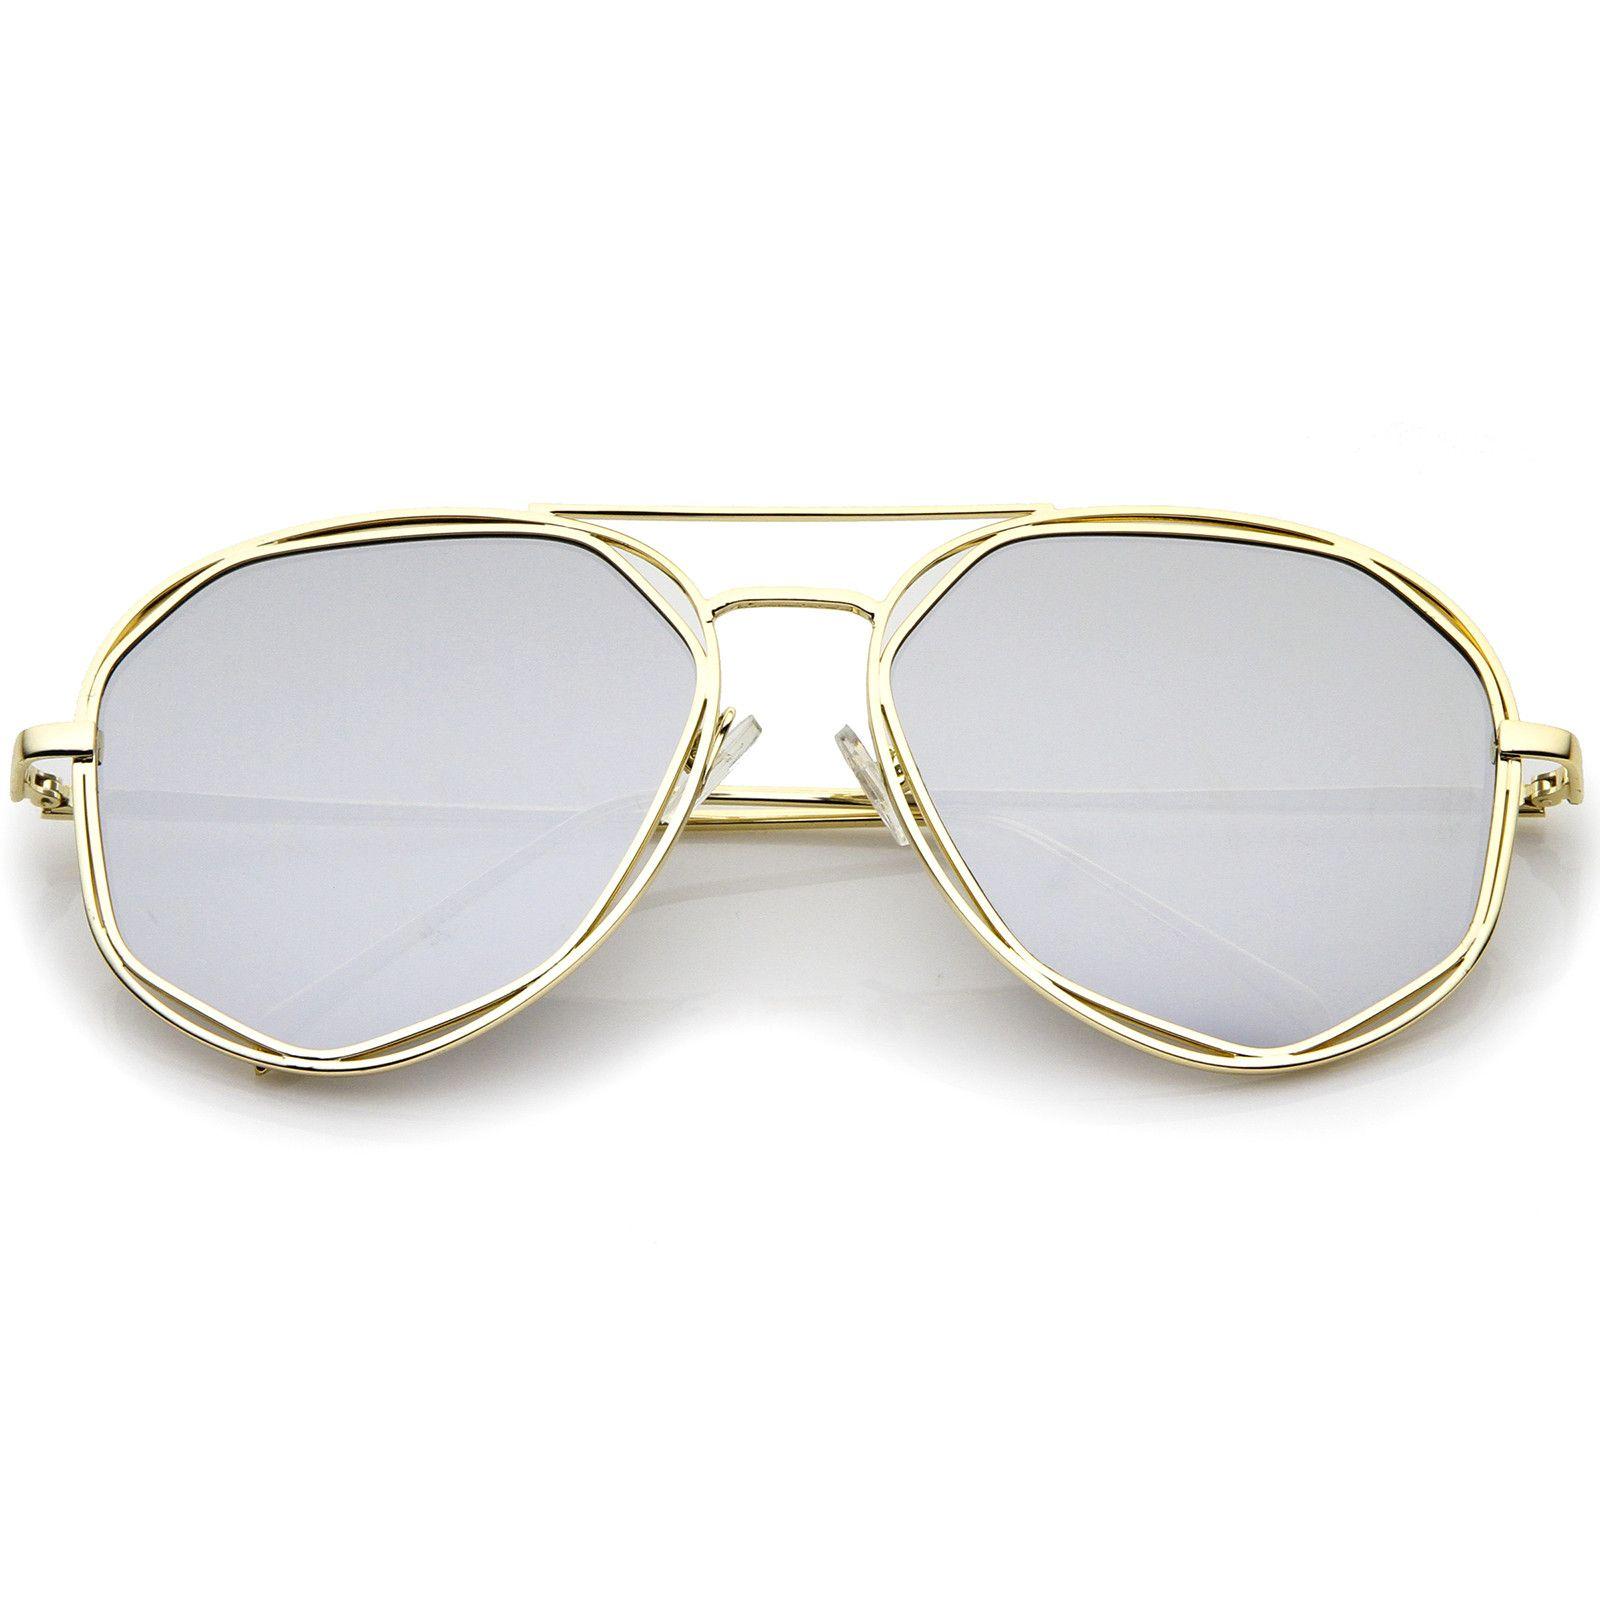 94a73eb6f1e9f Geometric Hexagonal Metal Frame Colored Mirror Flat Lens Aviator Sunglasses  60mm